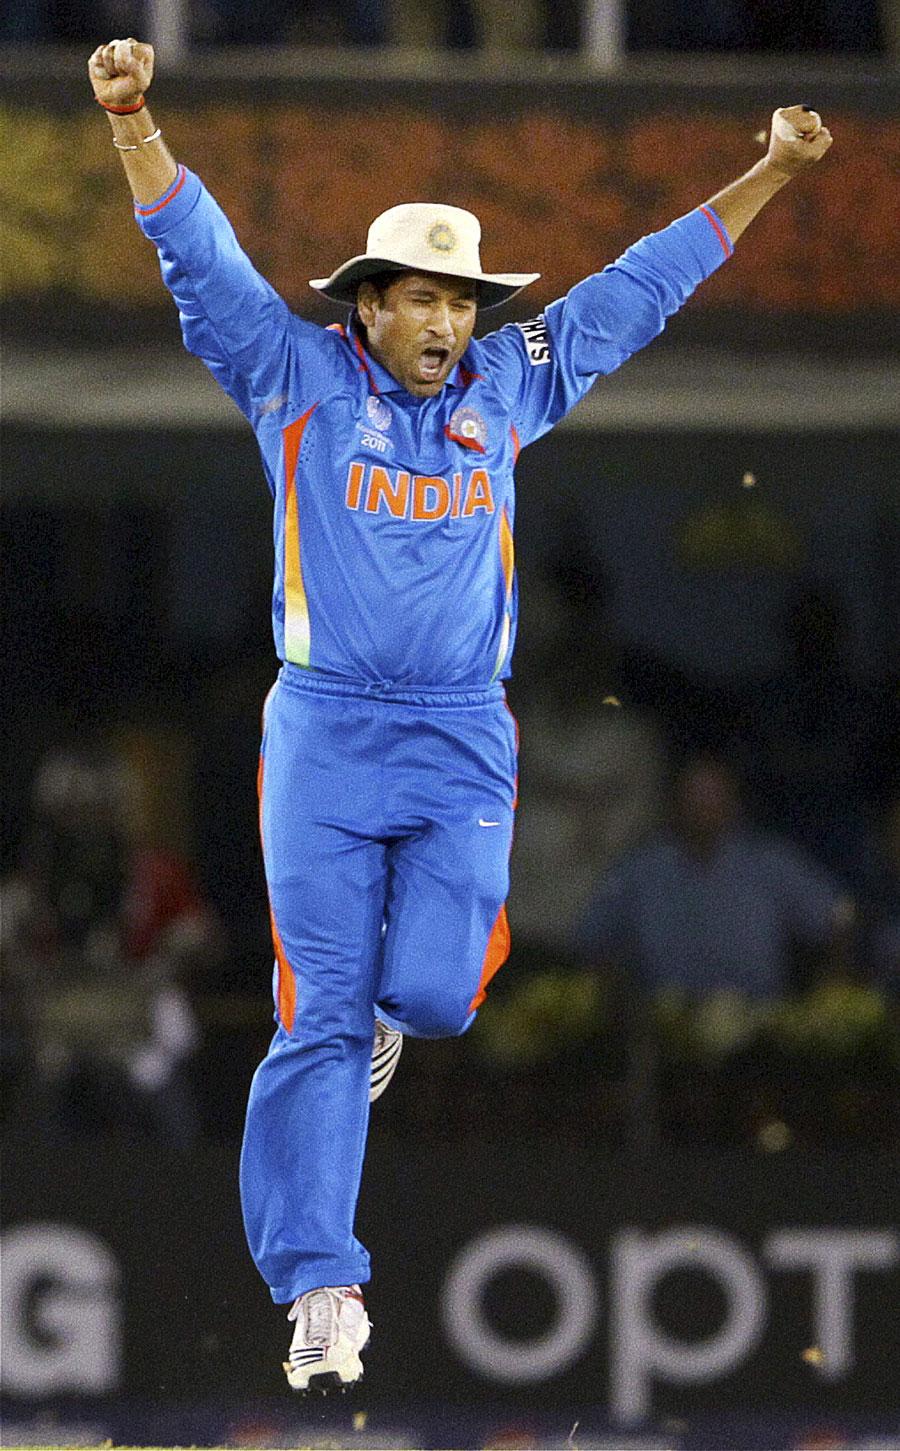 Sachin Tendulkar Celebrates Indias Win With An Ecstatic Leap